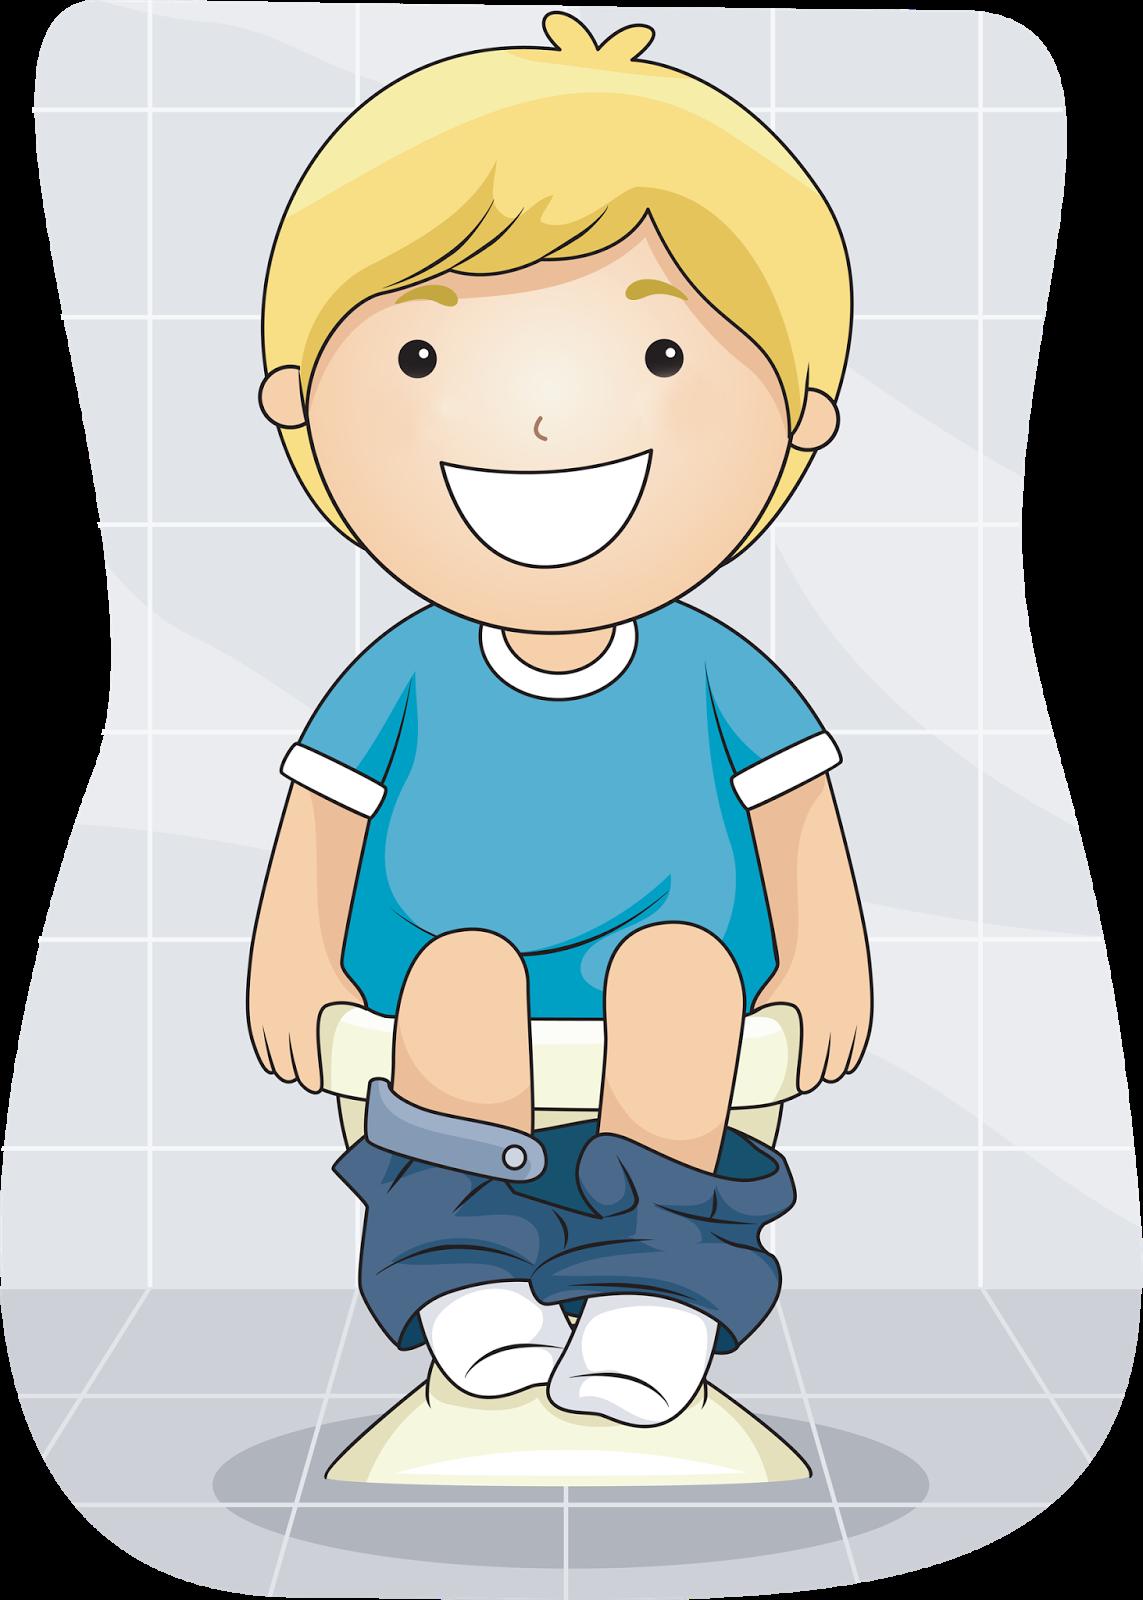 Clipart bathroom boy potty training, Clipart bathroom boy.